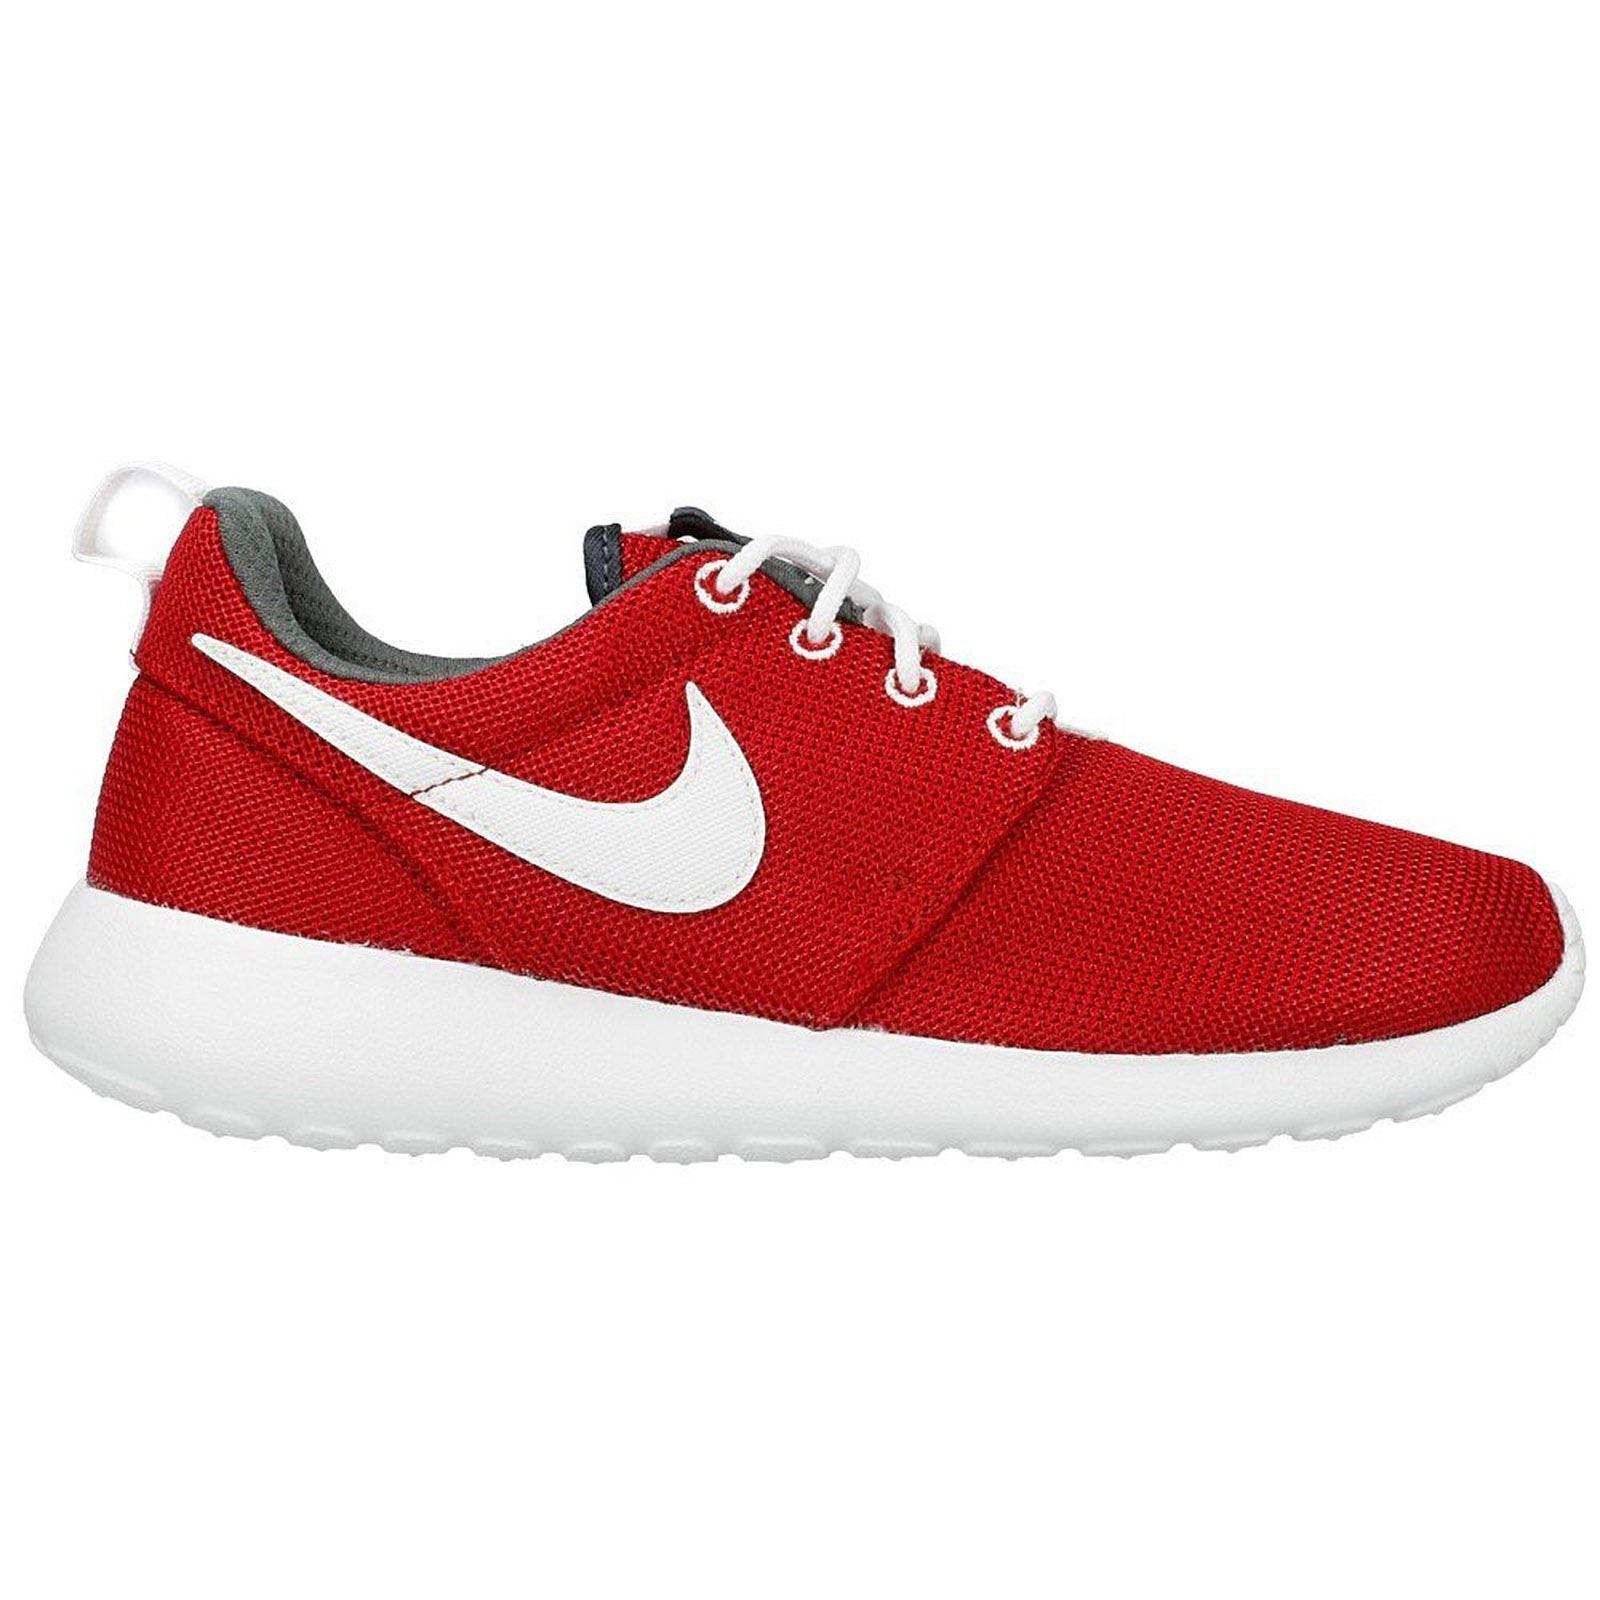 Nike Roshe Run Boys Girls Big Kids Youth Fitness Sports ...